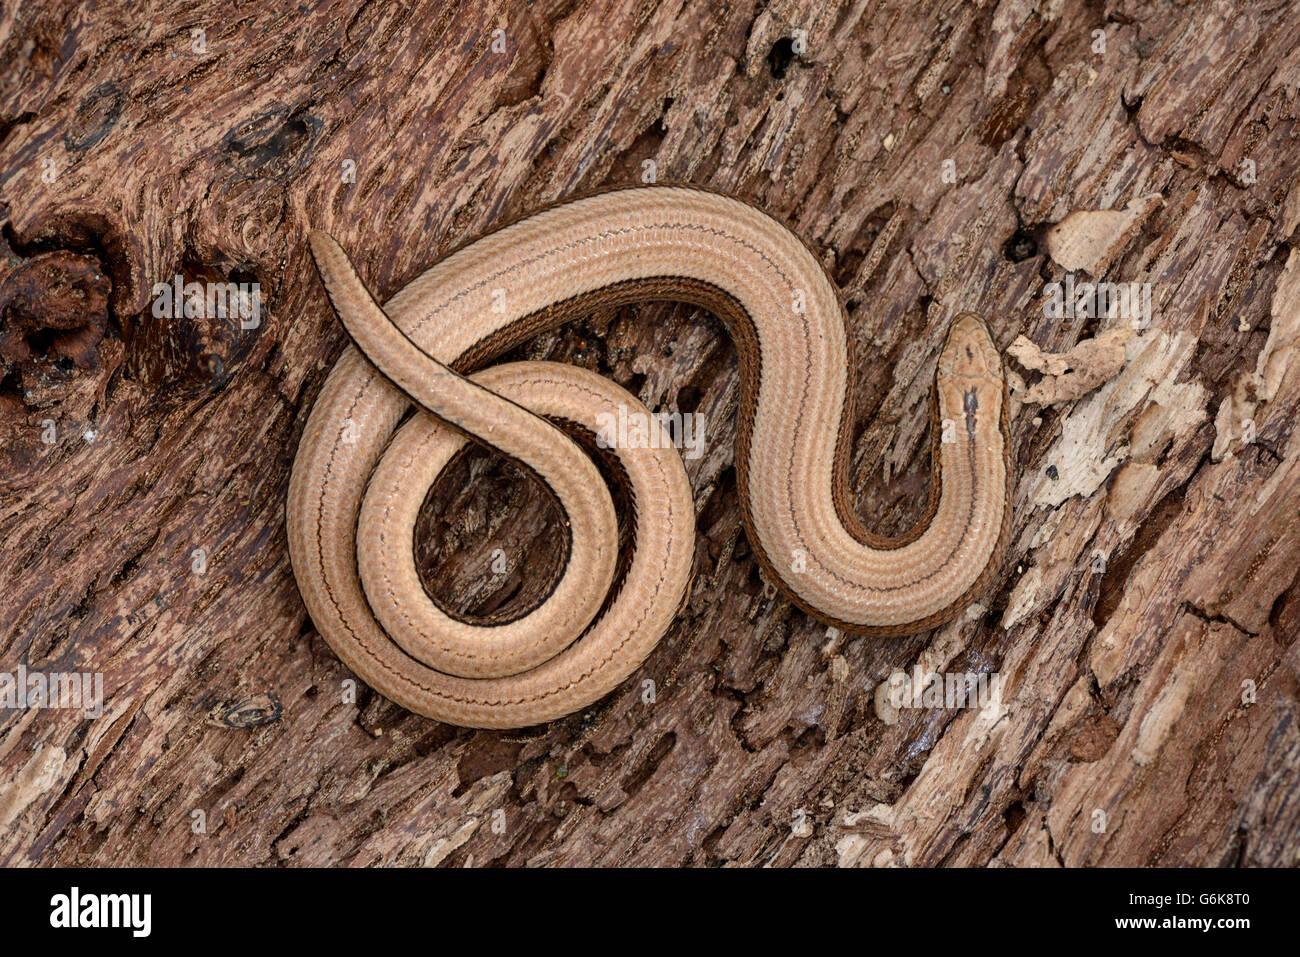 Blindworm on bark Stock Photo